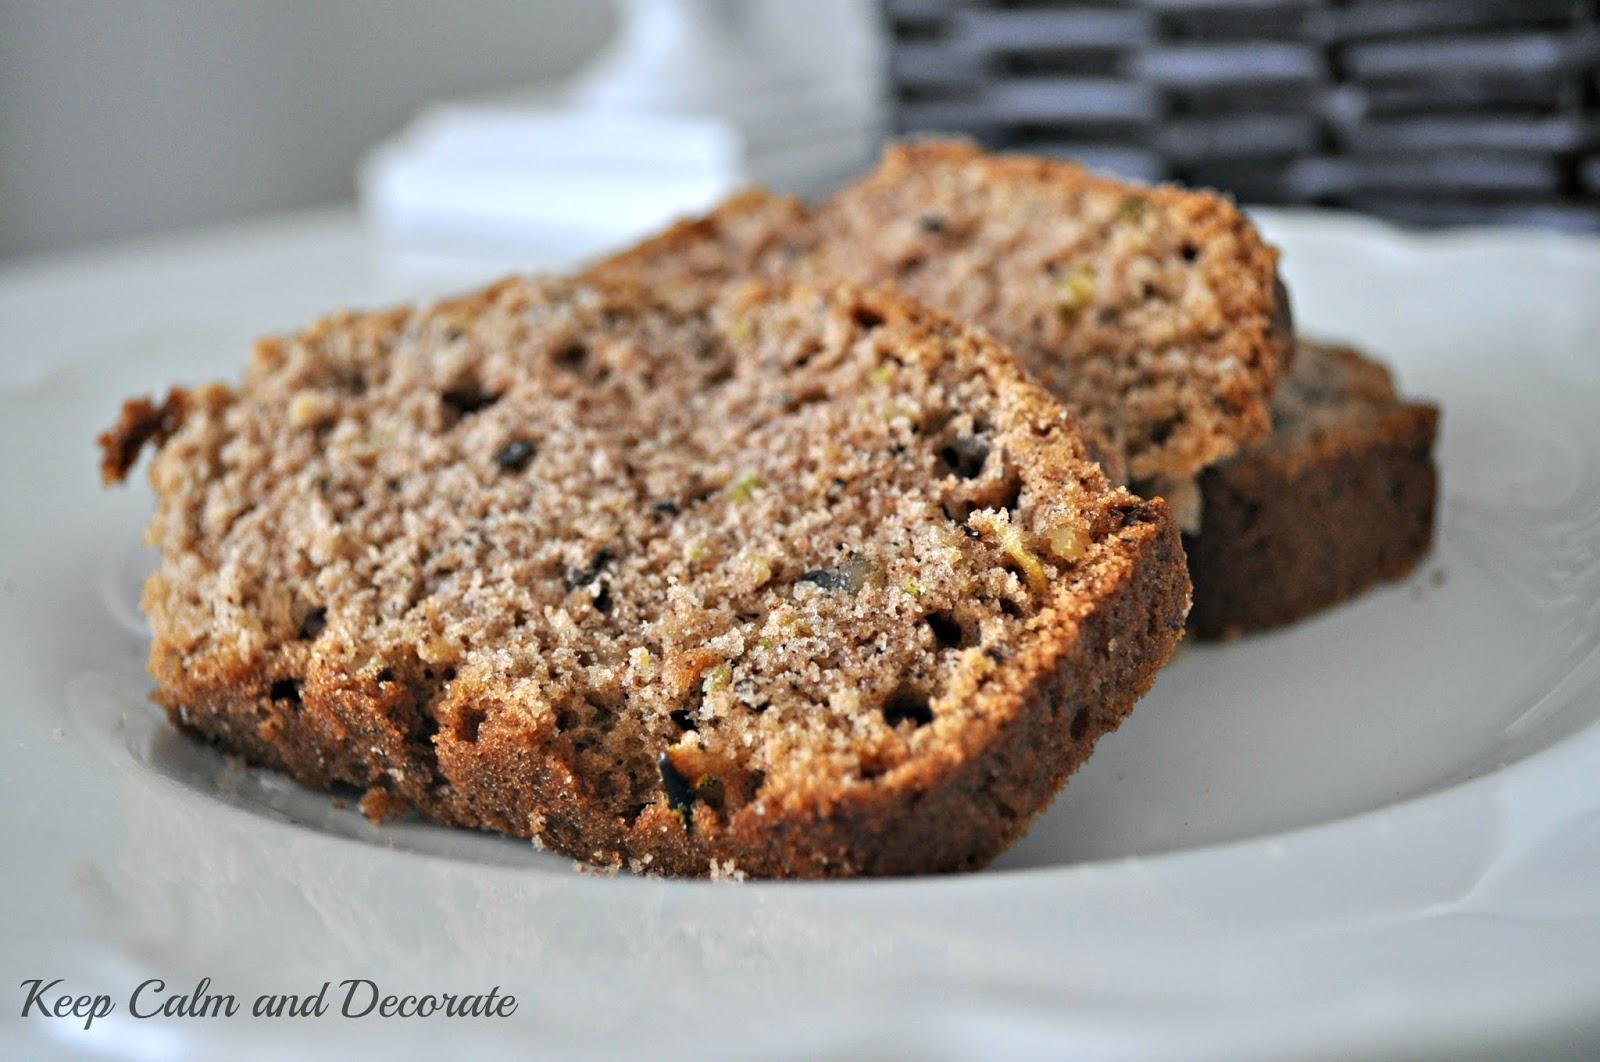 Keep Calm and Decorate: Grandma's Zucchini Bread Recipe